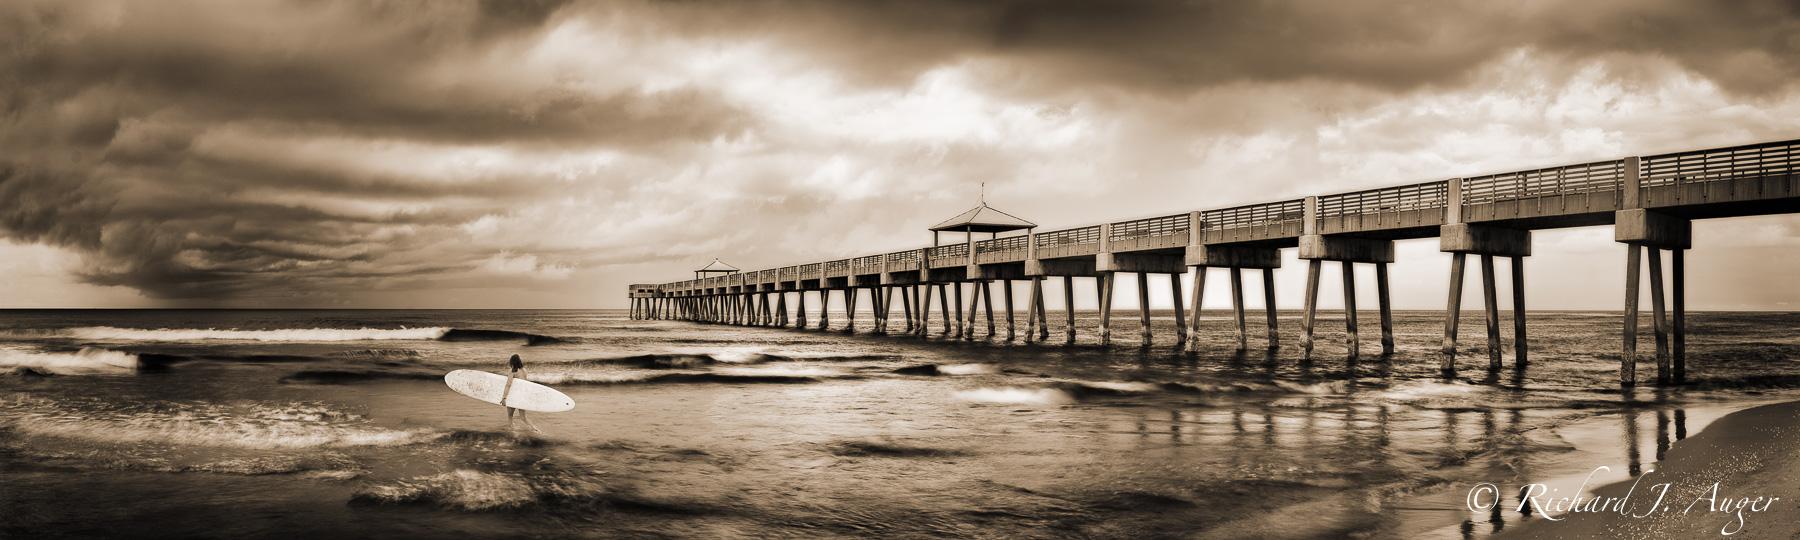 Juno Beach Pier, Florida, Palm Beach, Surfer Girl, Storm, Photograph, Photographer, Ocean, Waves, sepia tone, black and white, panorama